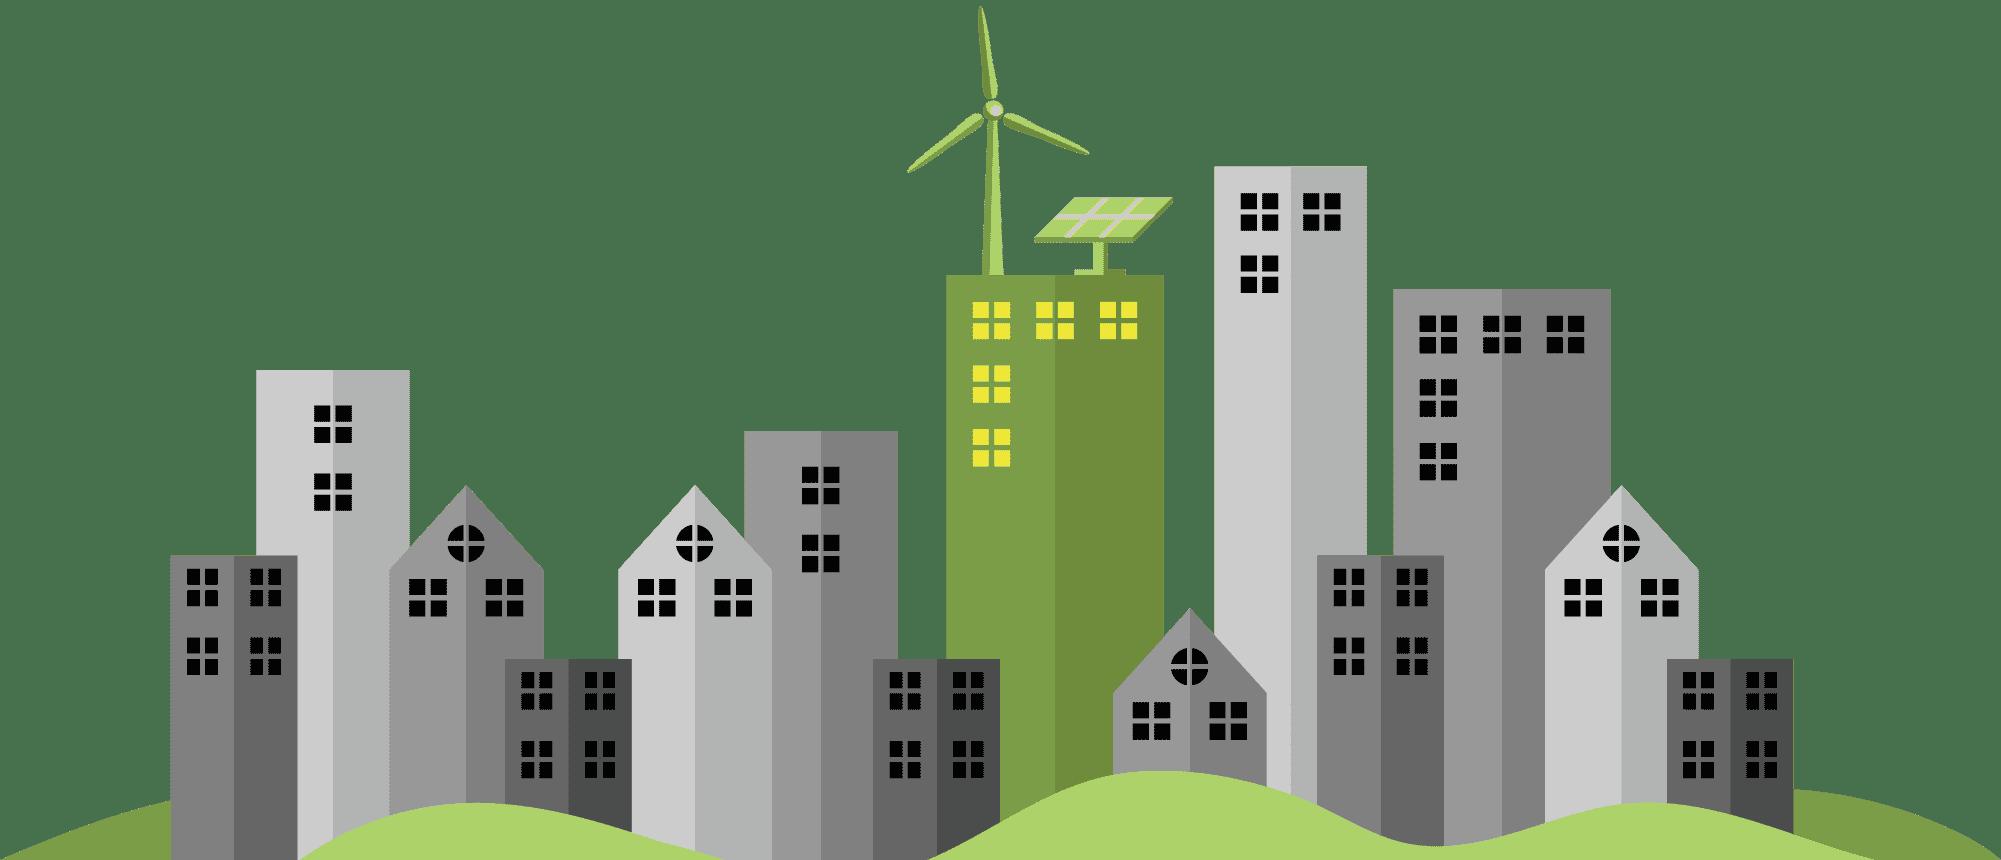 VECKTA - The Energy Transition Platform